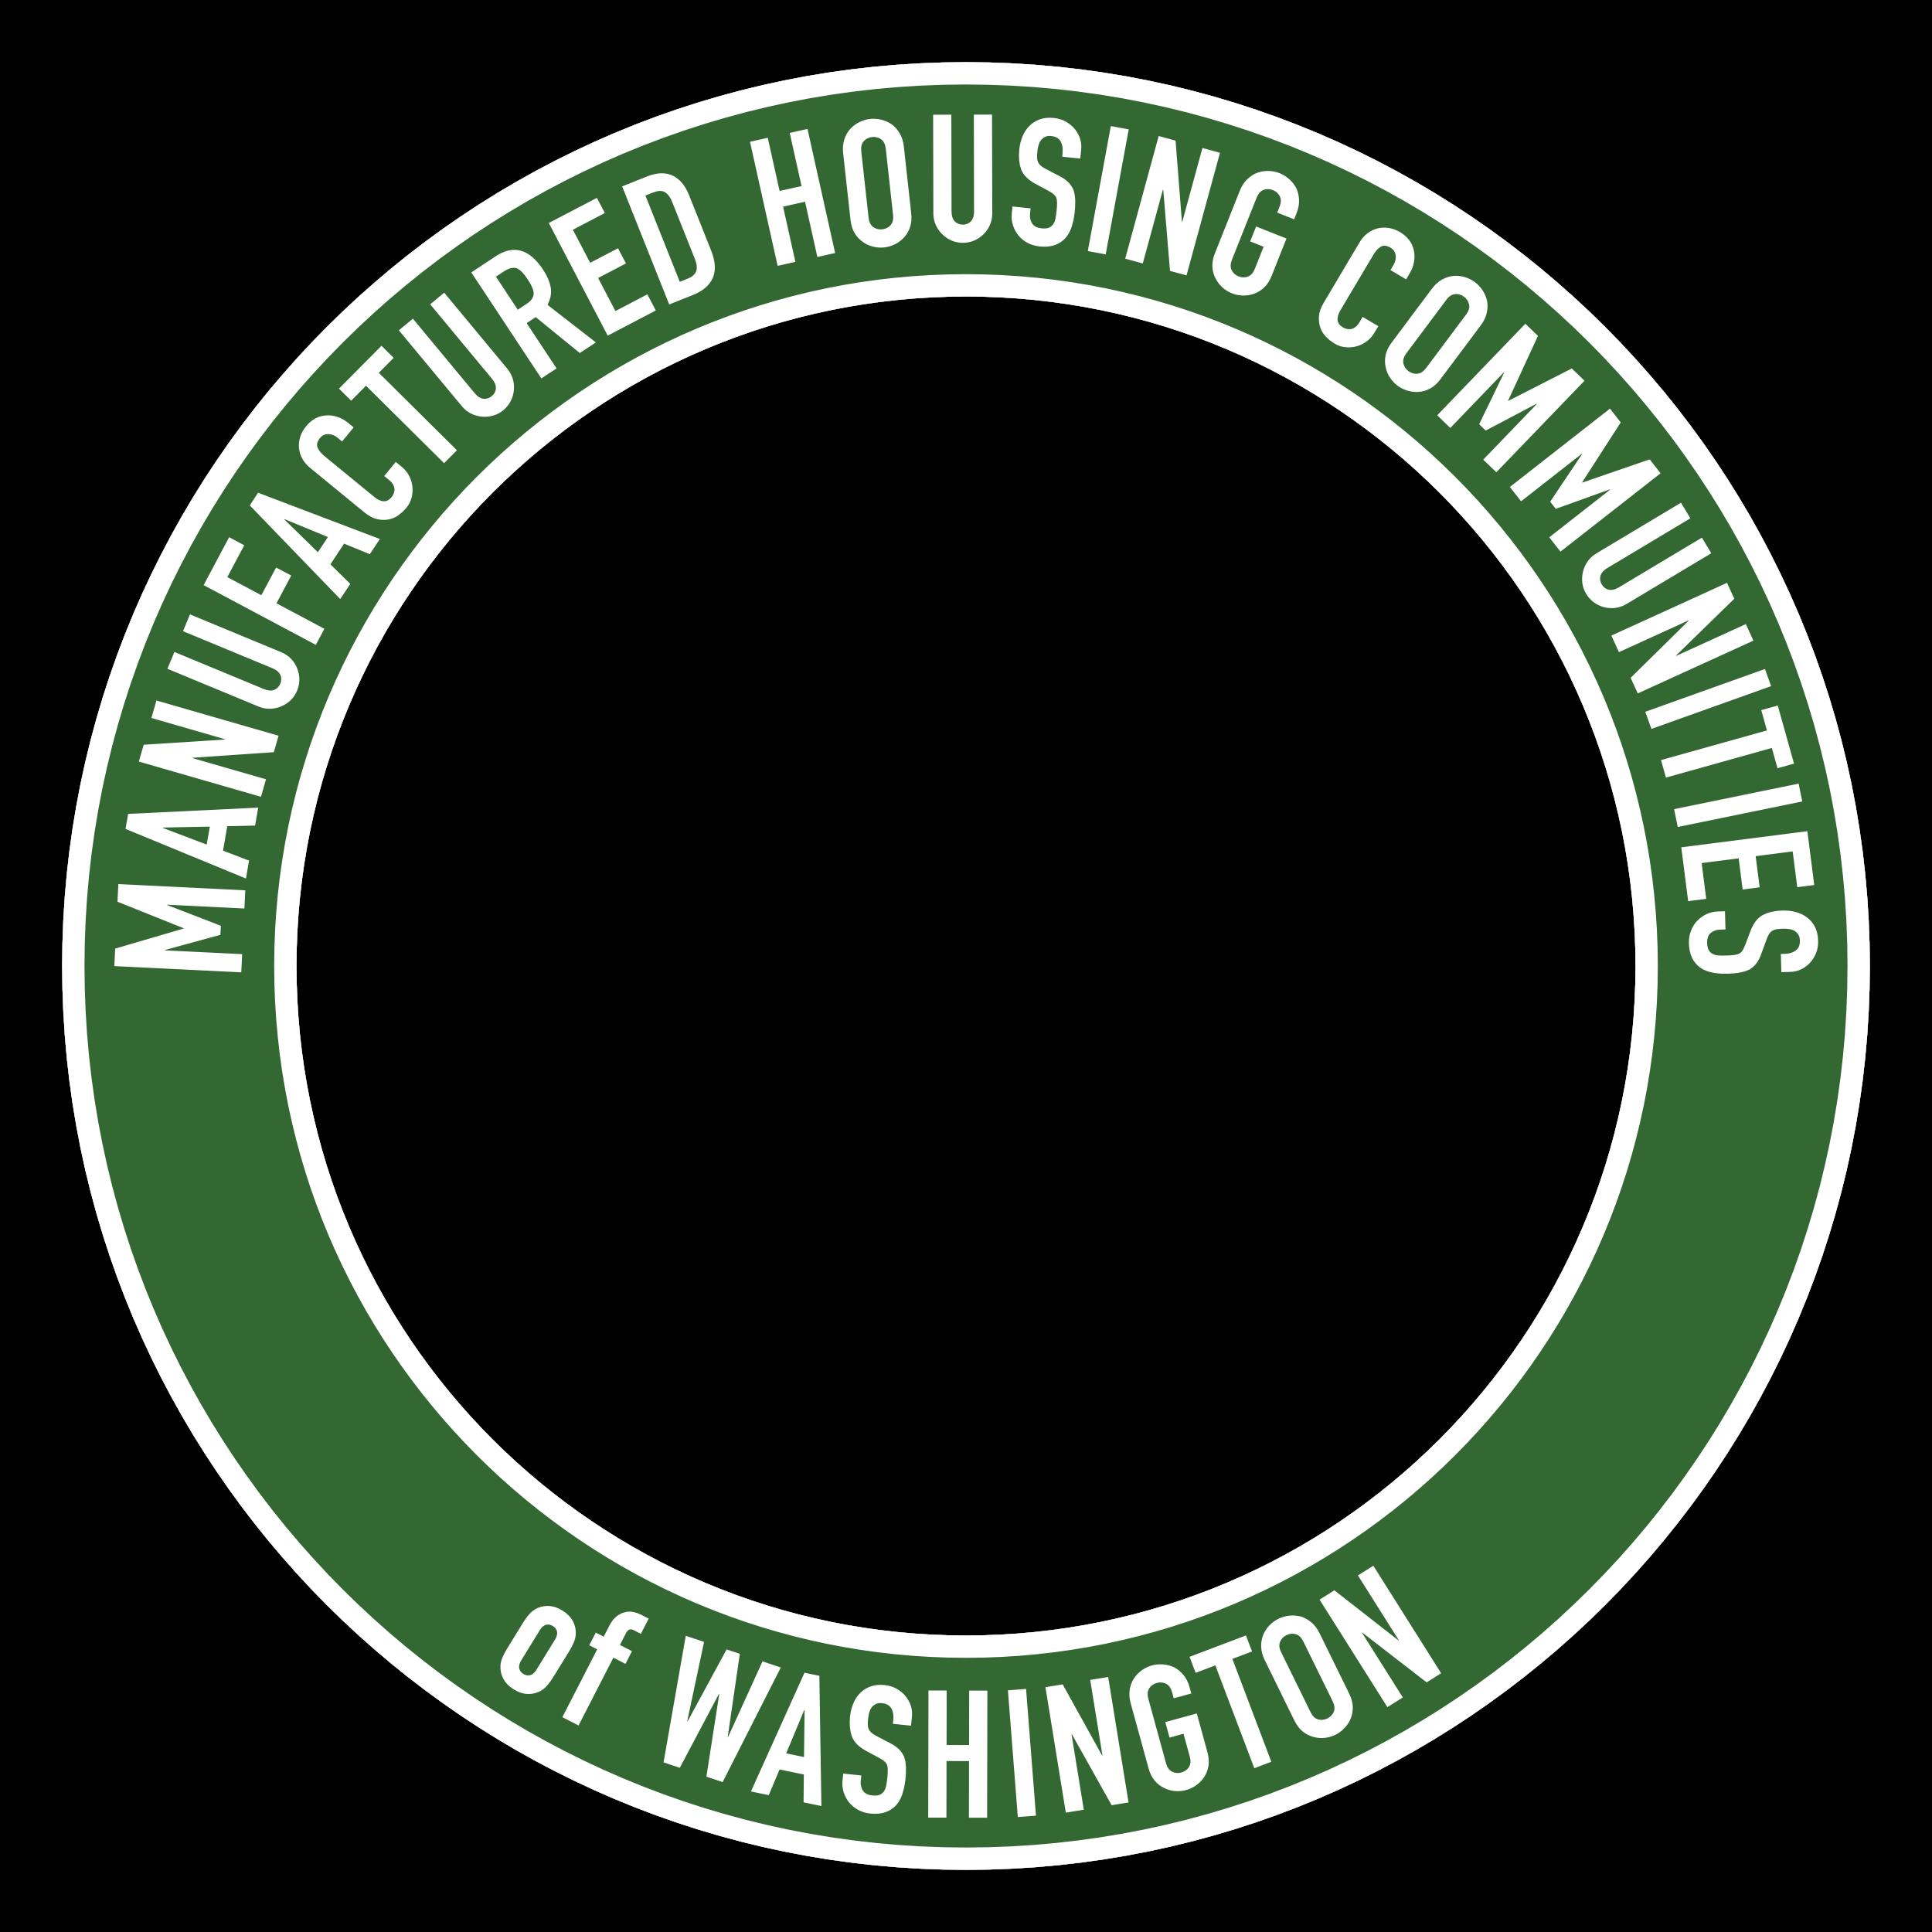 Manufactured Housing Communities of Washington Logo